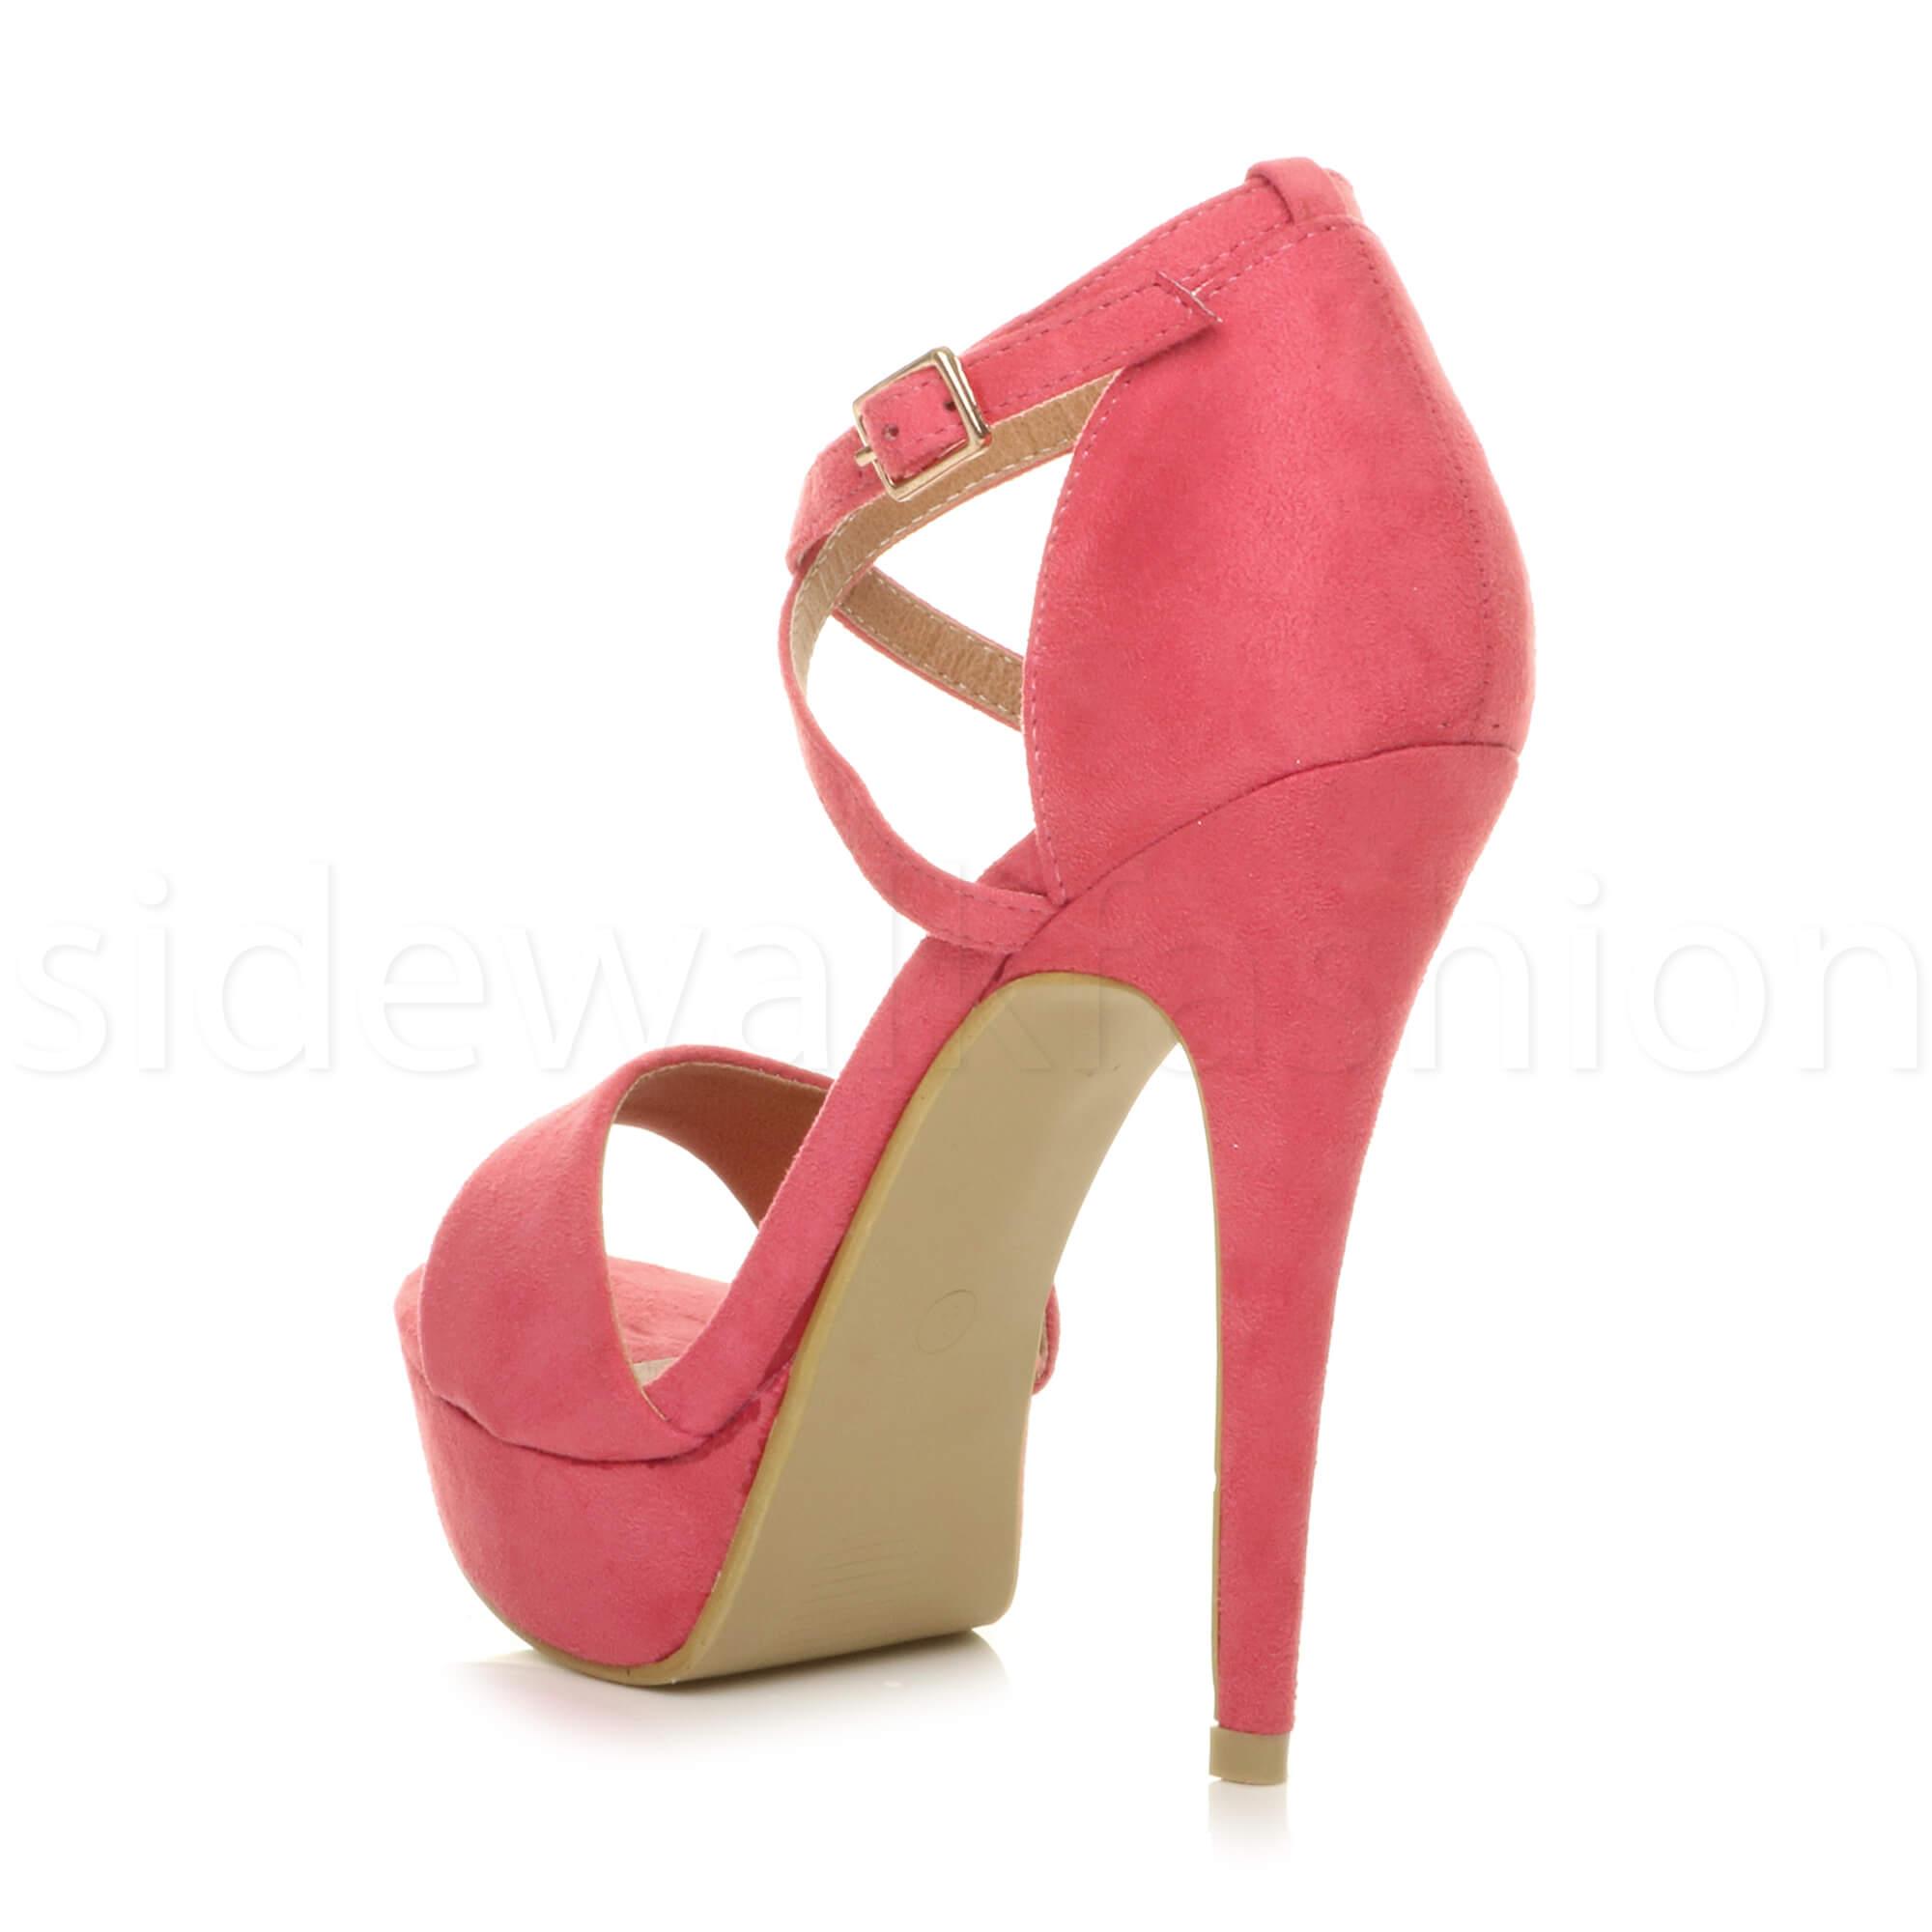 53407a717c09 Womens ladies high heel platform crossed strappy evening prom ...